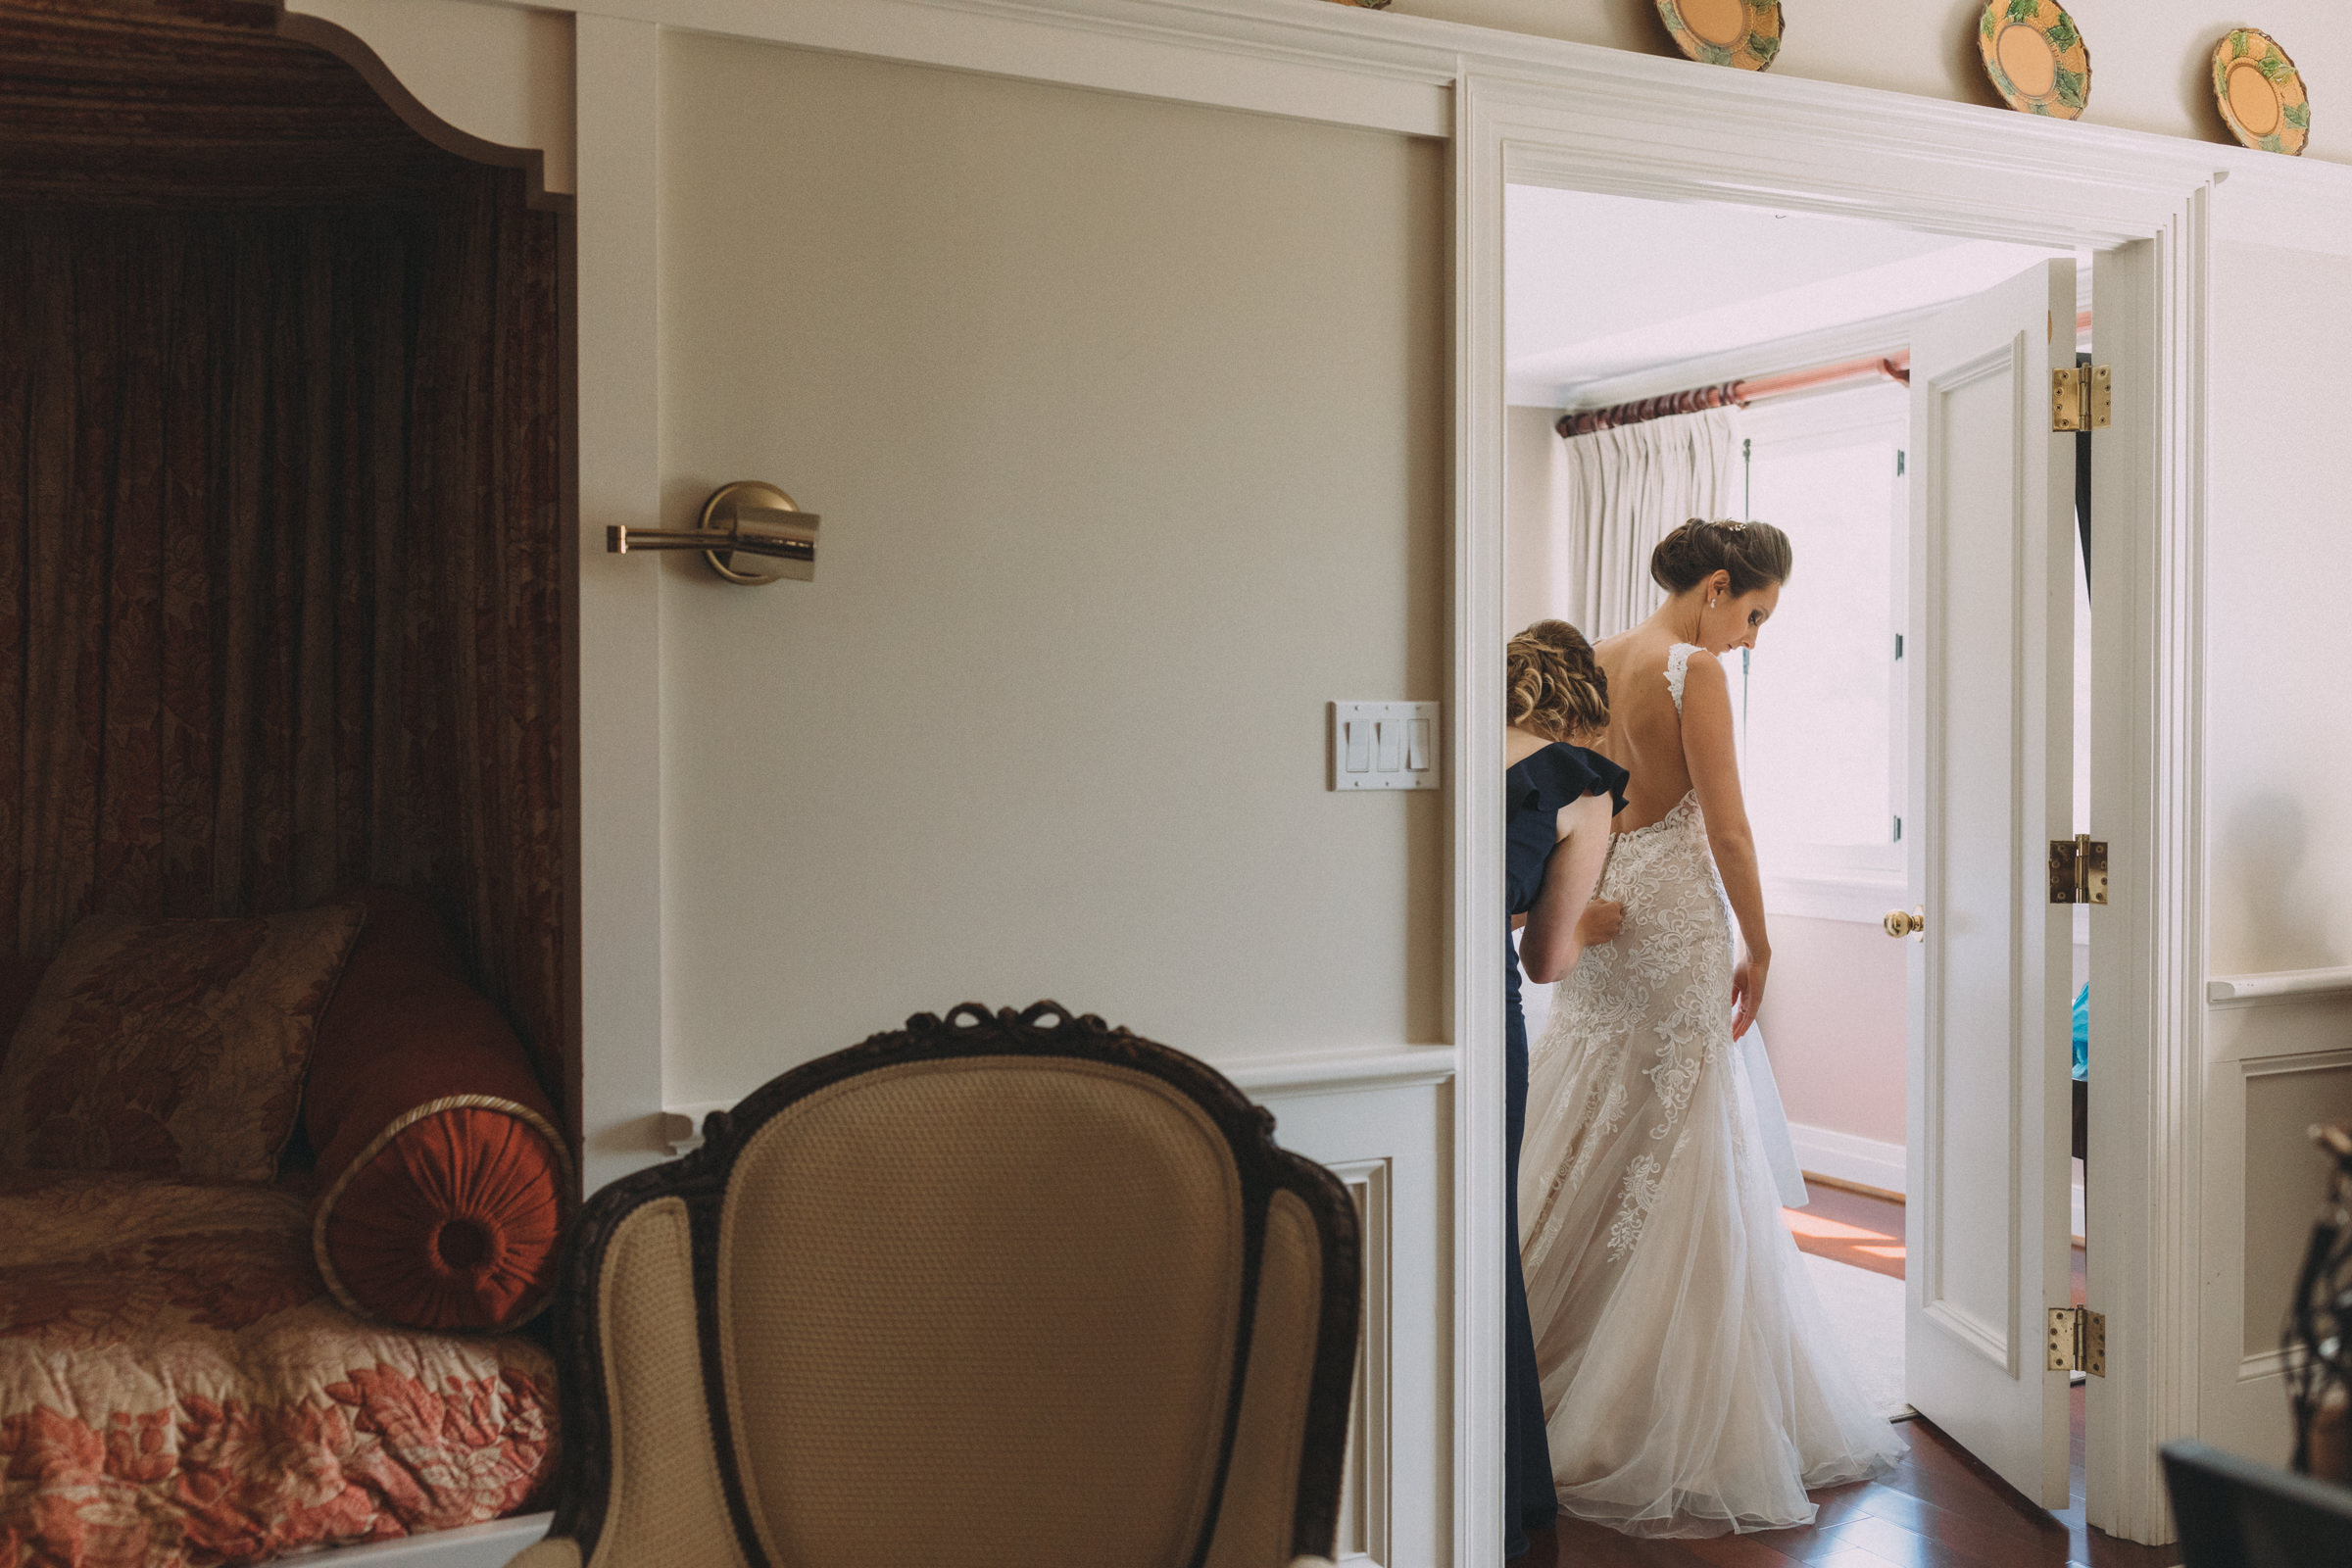 Langdon-Hall-wedding-photography-Cambridge-by-Sam-Wong-of-Visual-Cravings_Sarah-Ryan_11.jpg